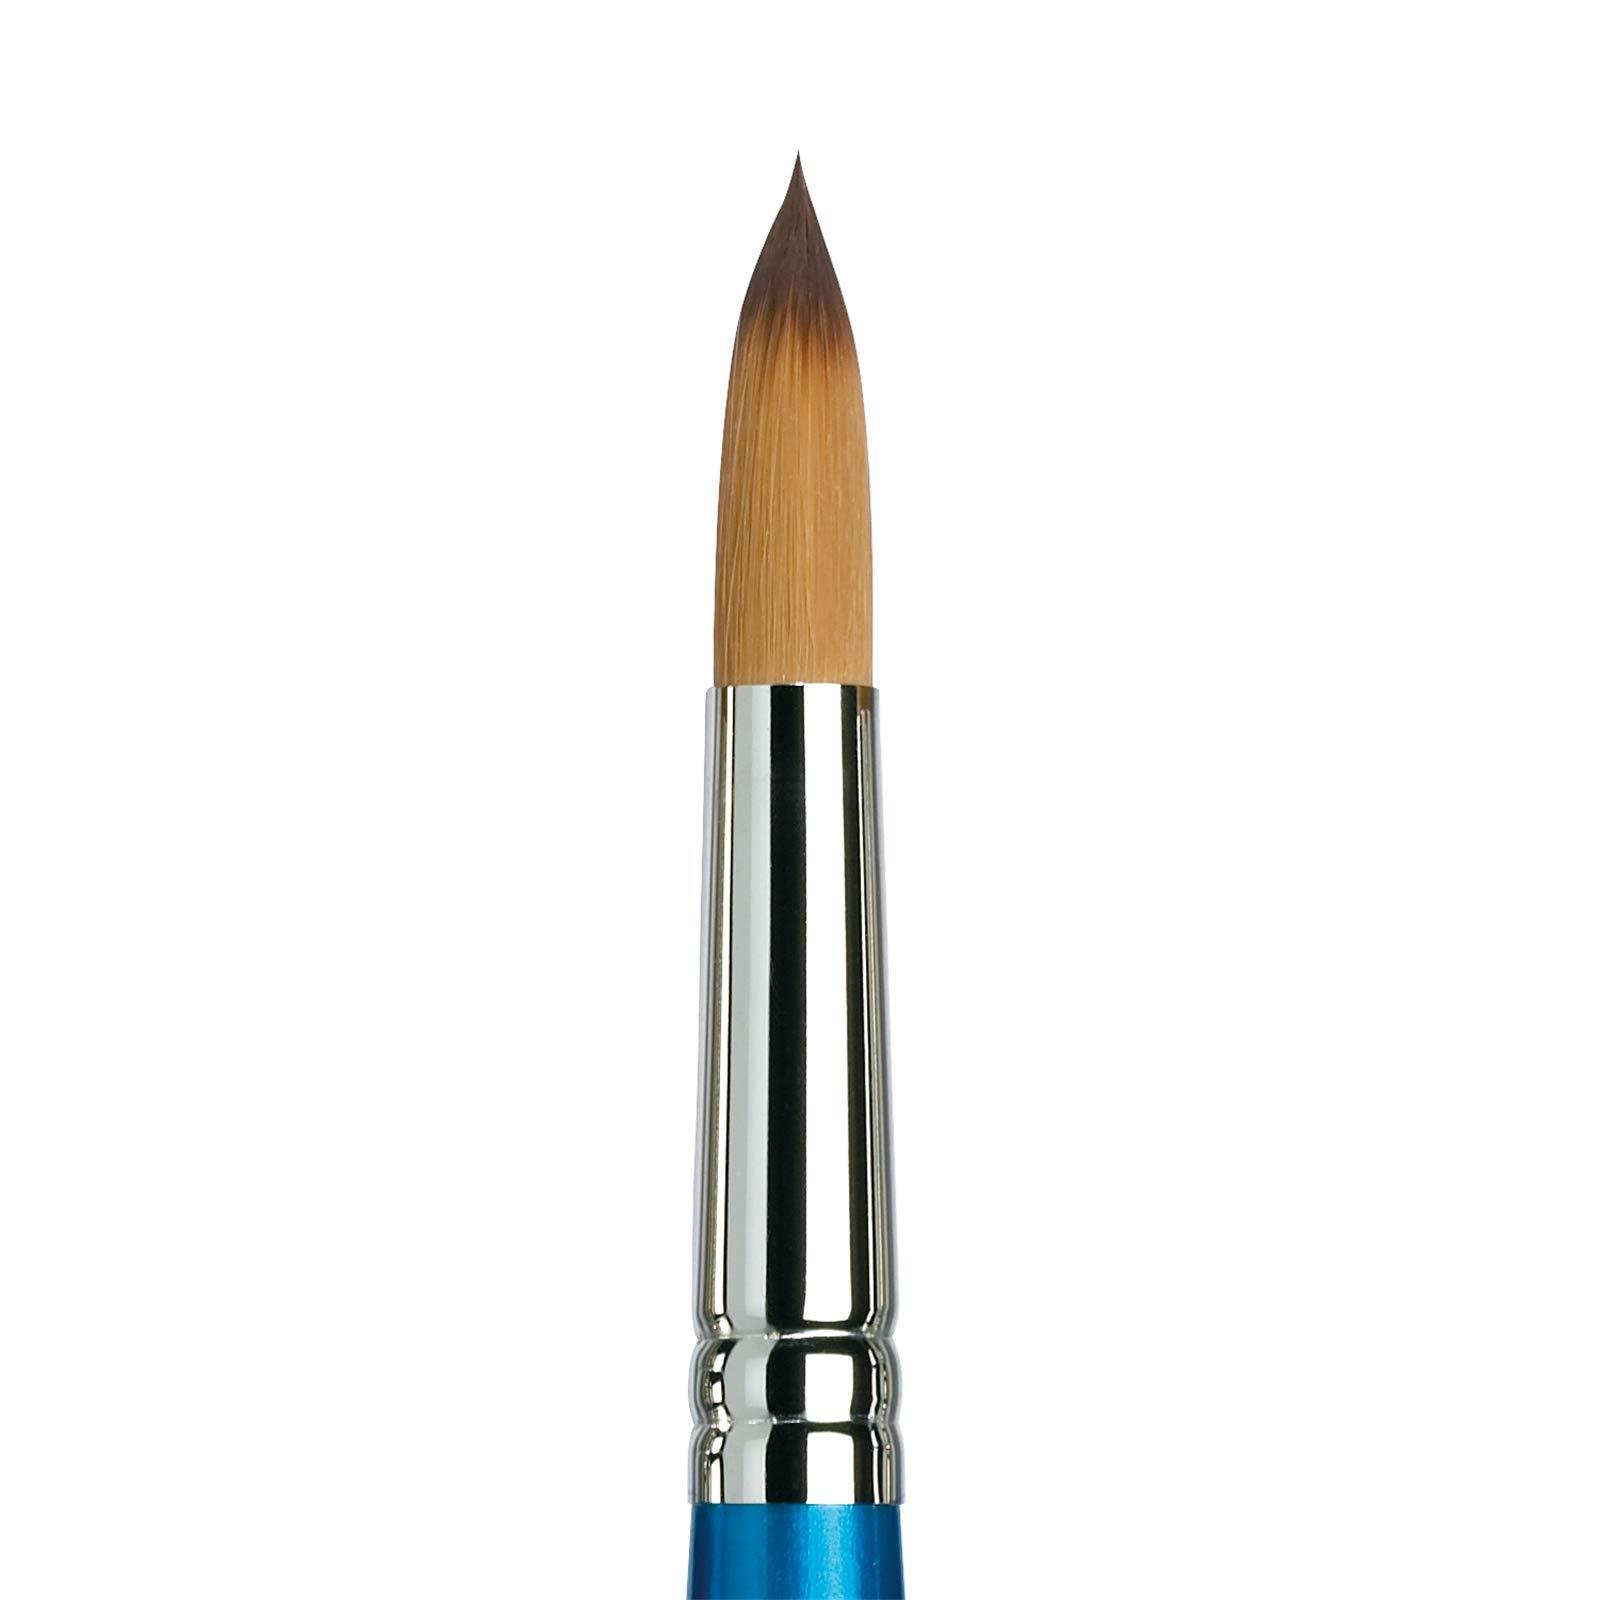 Winsor & Newton Brush, Wood, Transparent, No 16 -. 11.5 mm, Round - Brush, Short Handle by Winsor & Newton